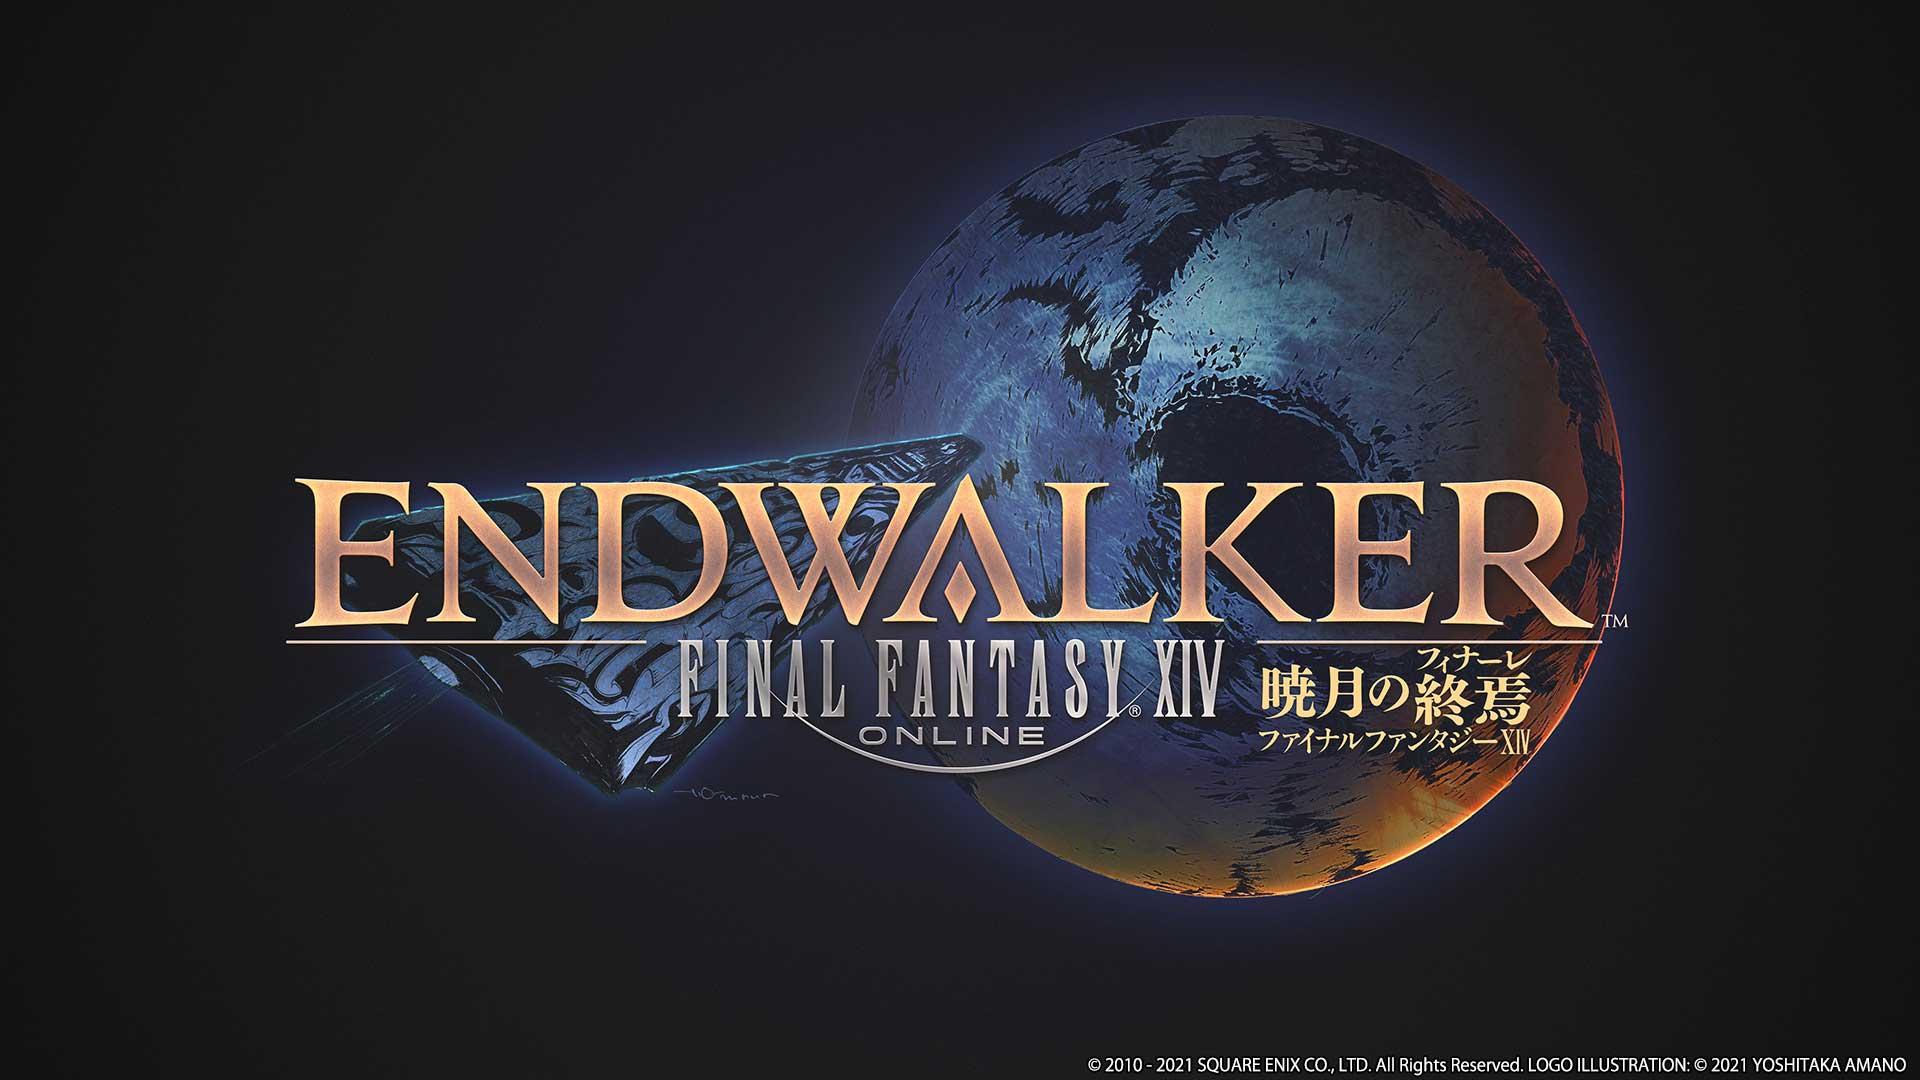 Final Fantasy XIV Endwalker PS5 PS4 Square Enix